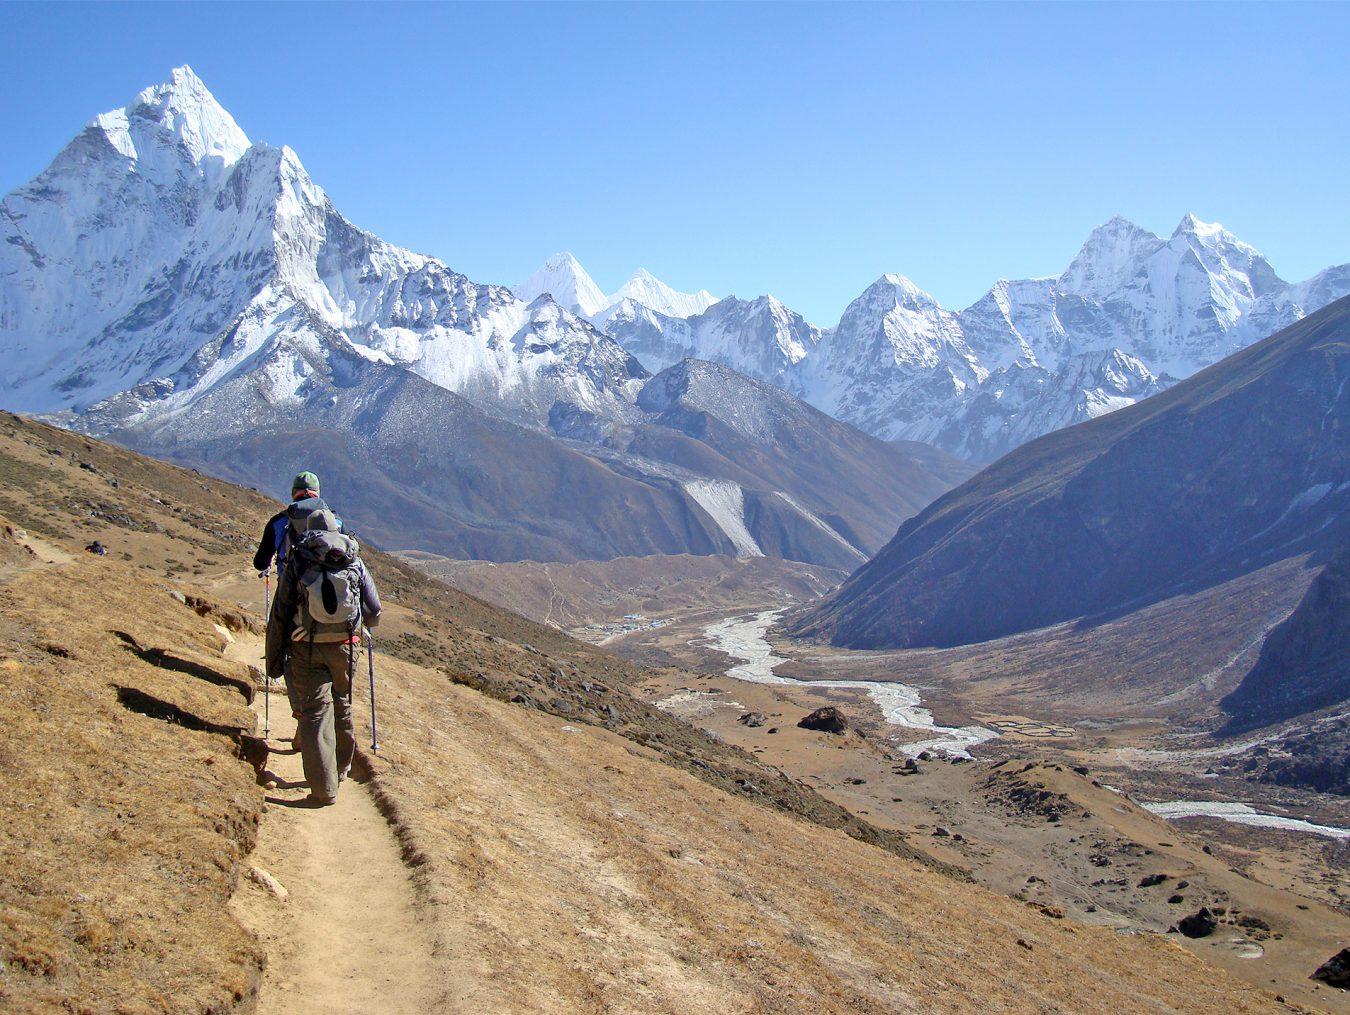 2 mountaineer trekking in himalaya